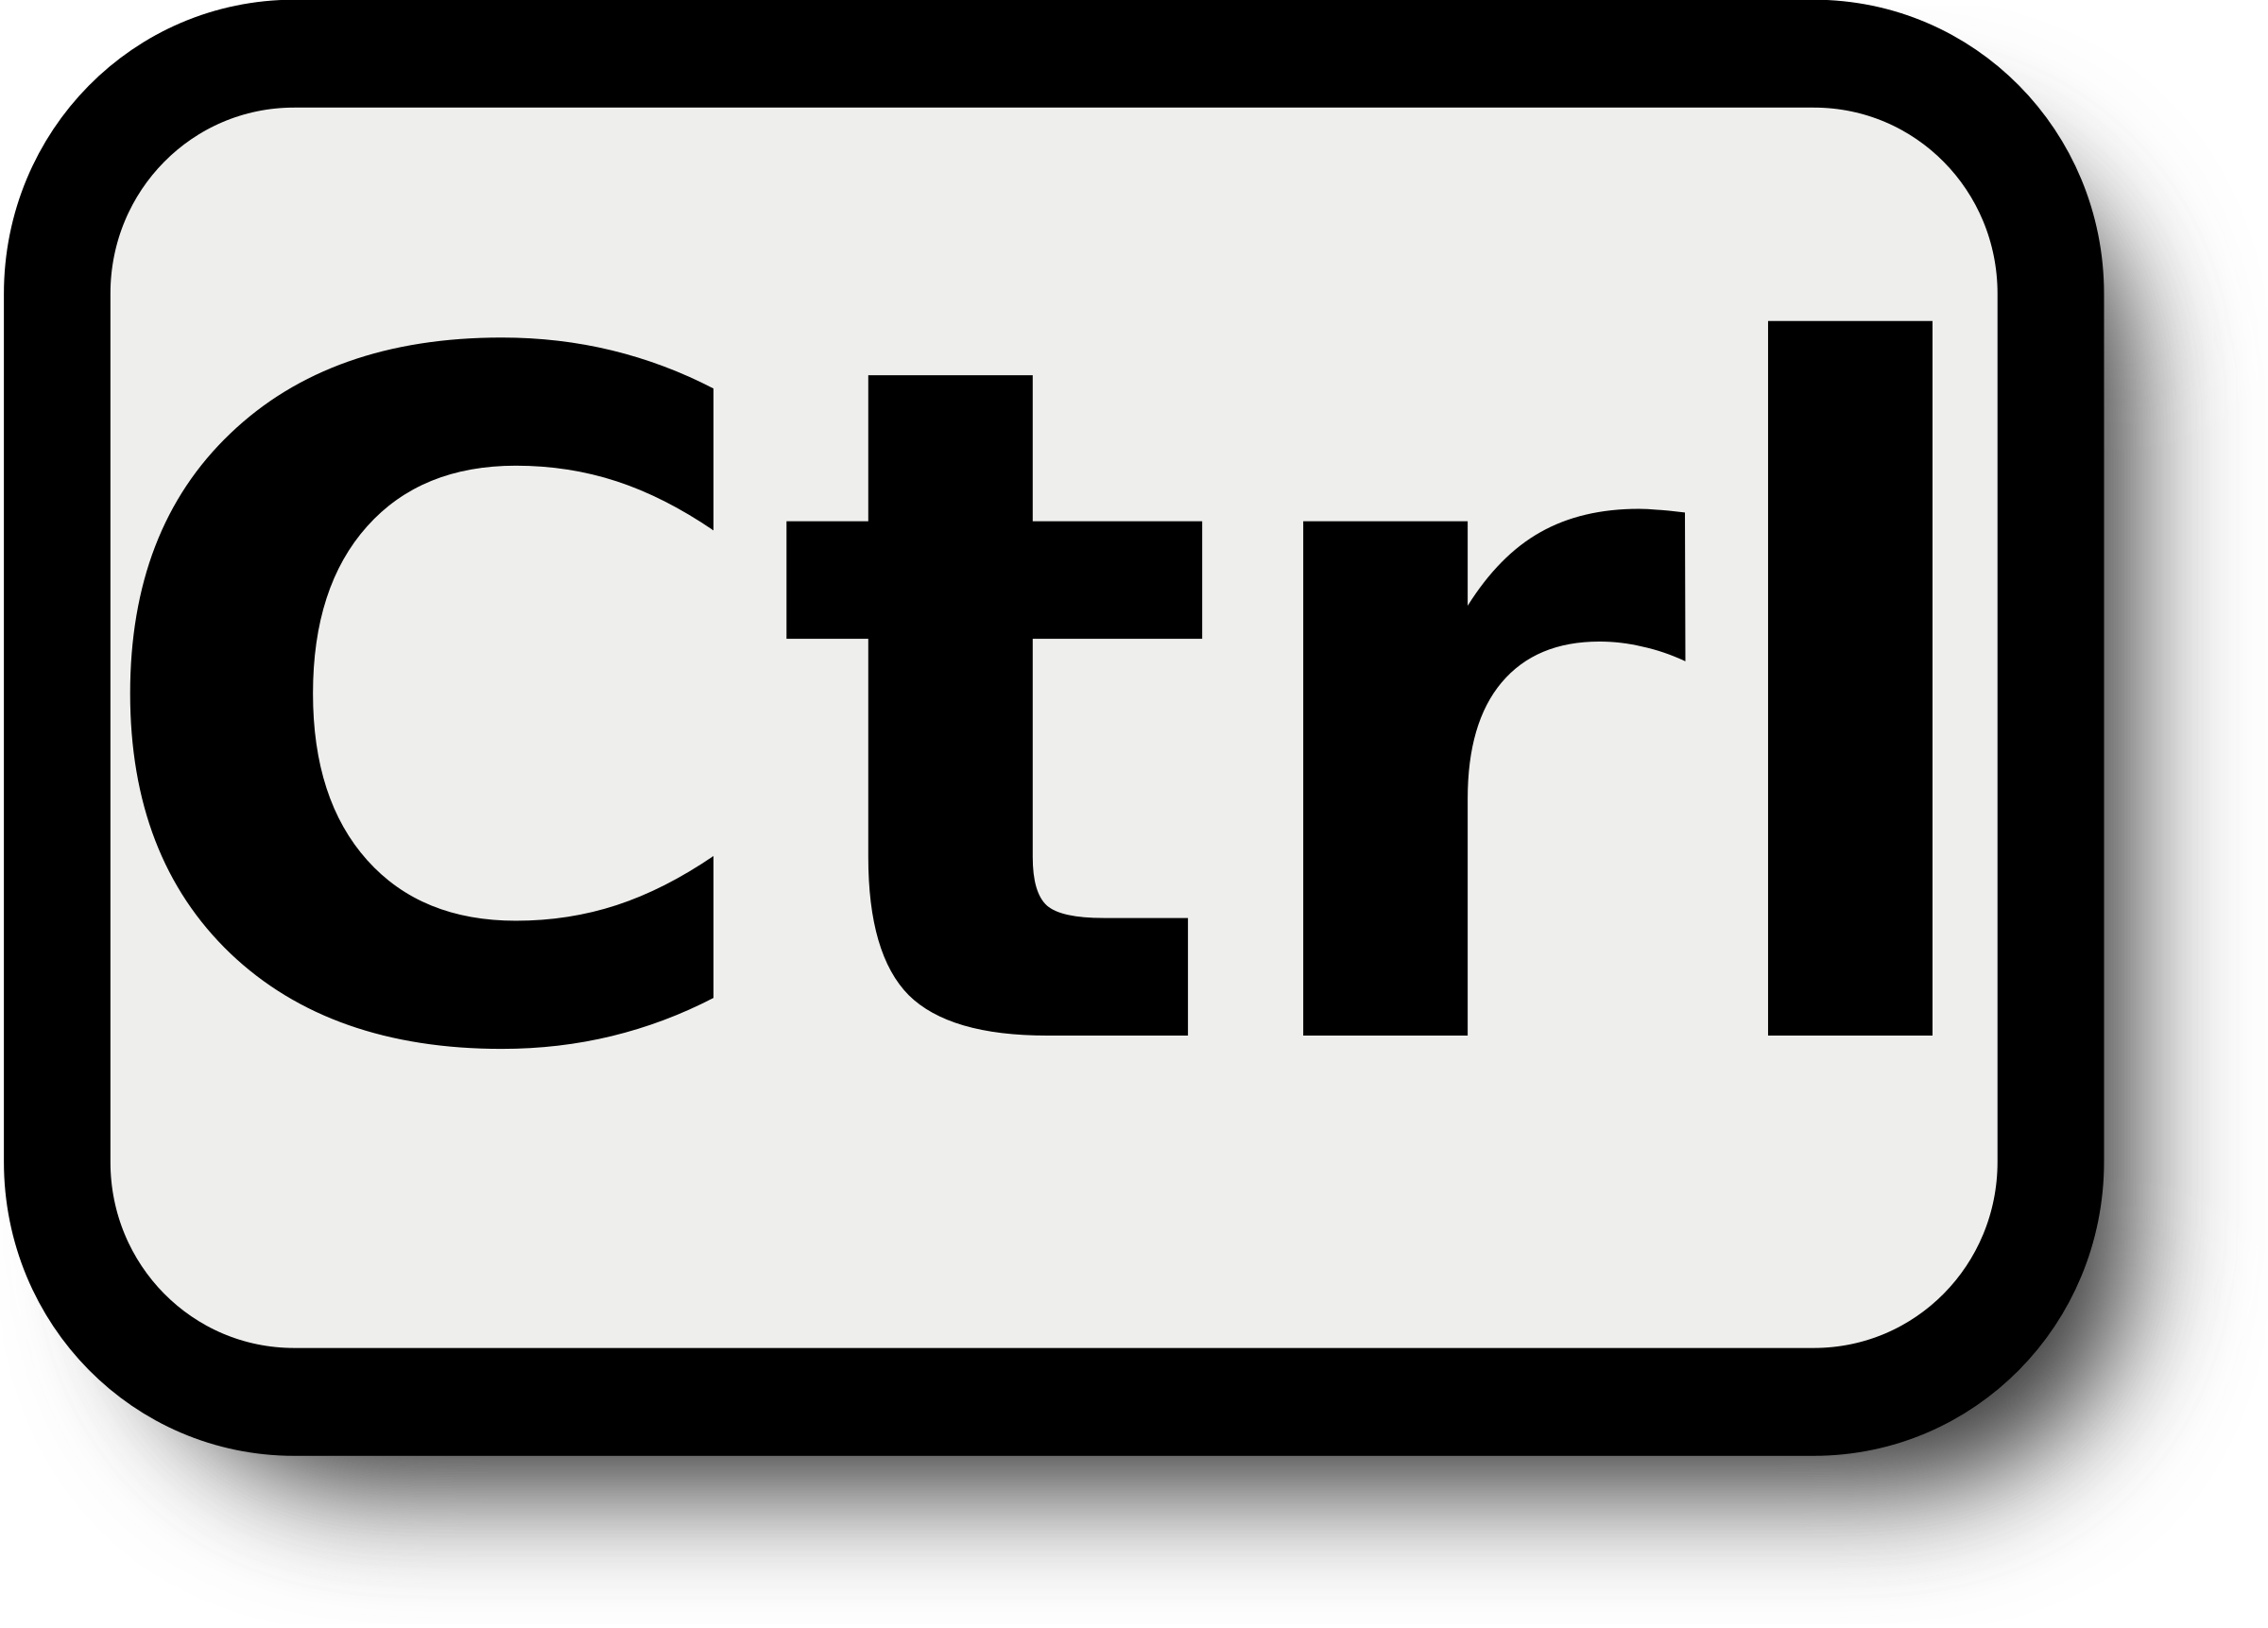 Ctrl key icons png. Keys clipart black and white